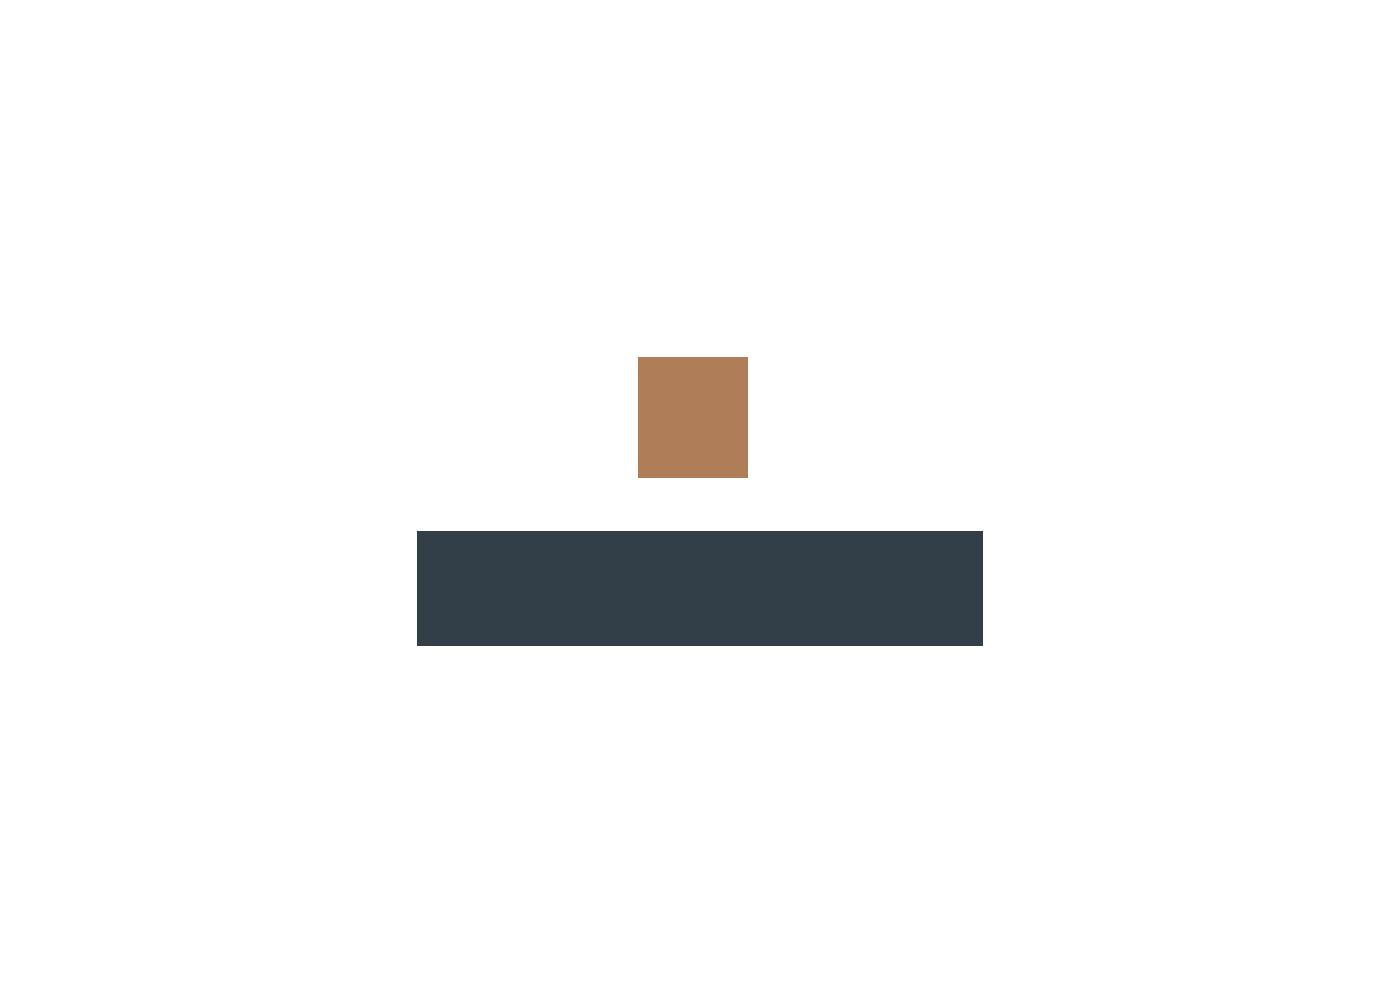 ryan-tarpley-personal-brand-01.png